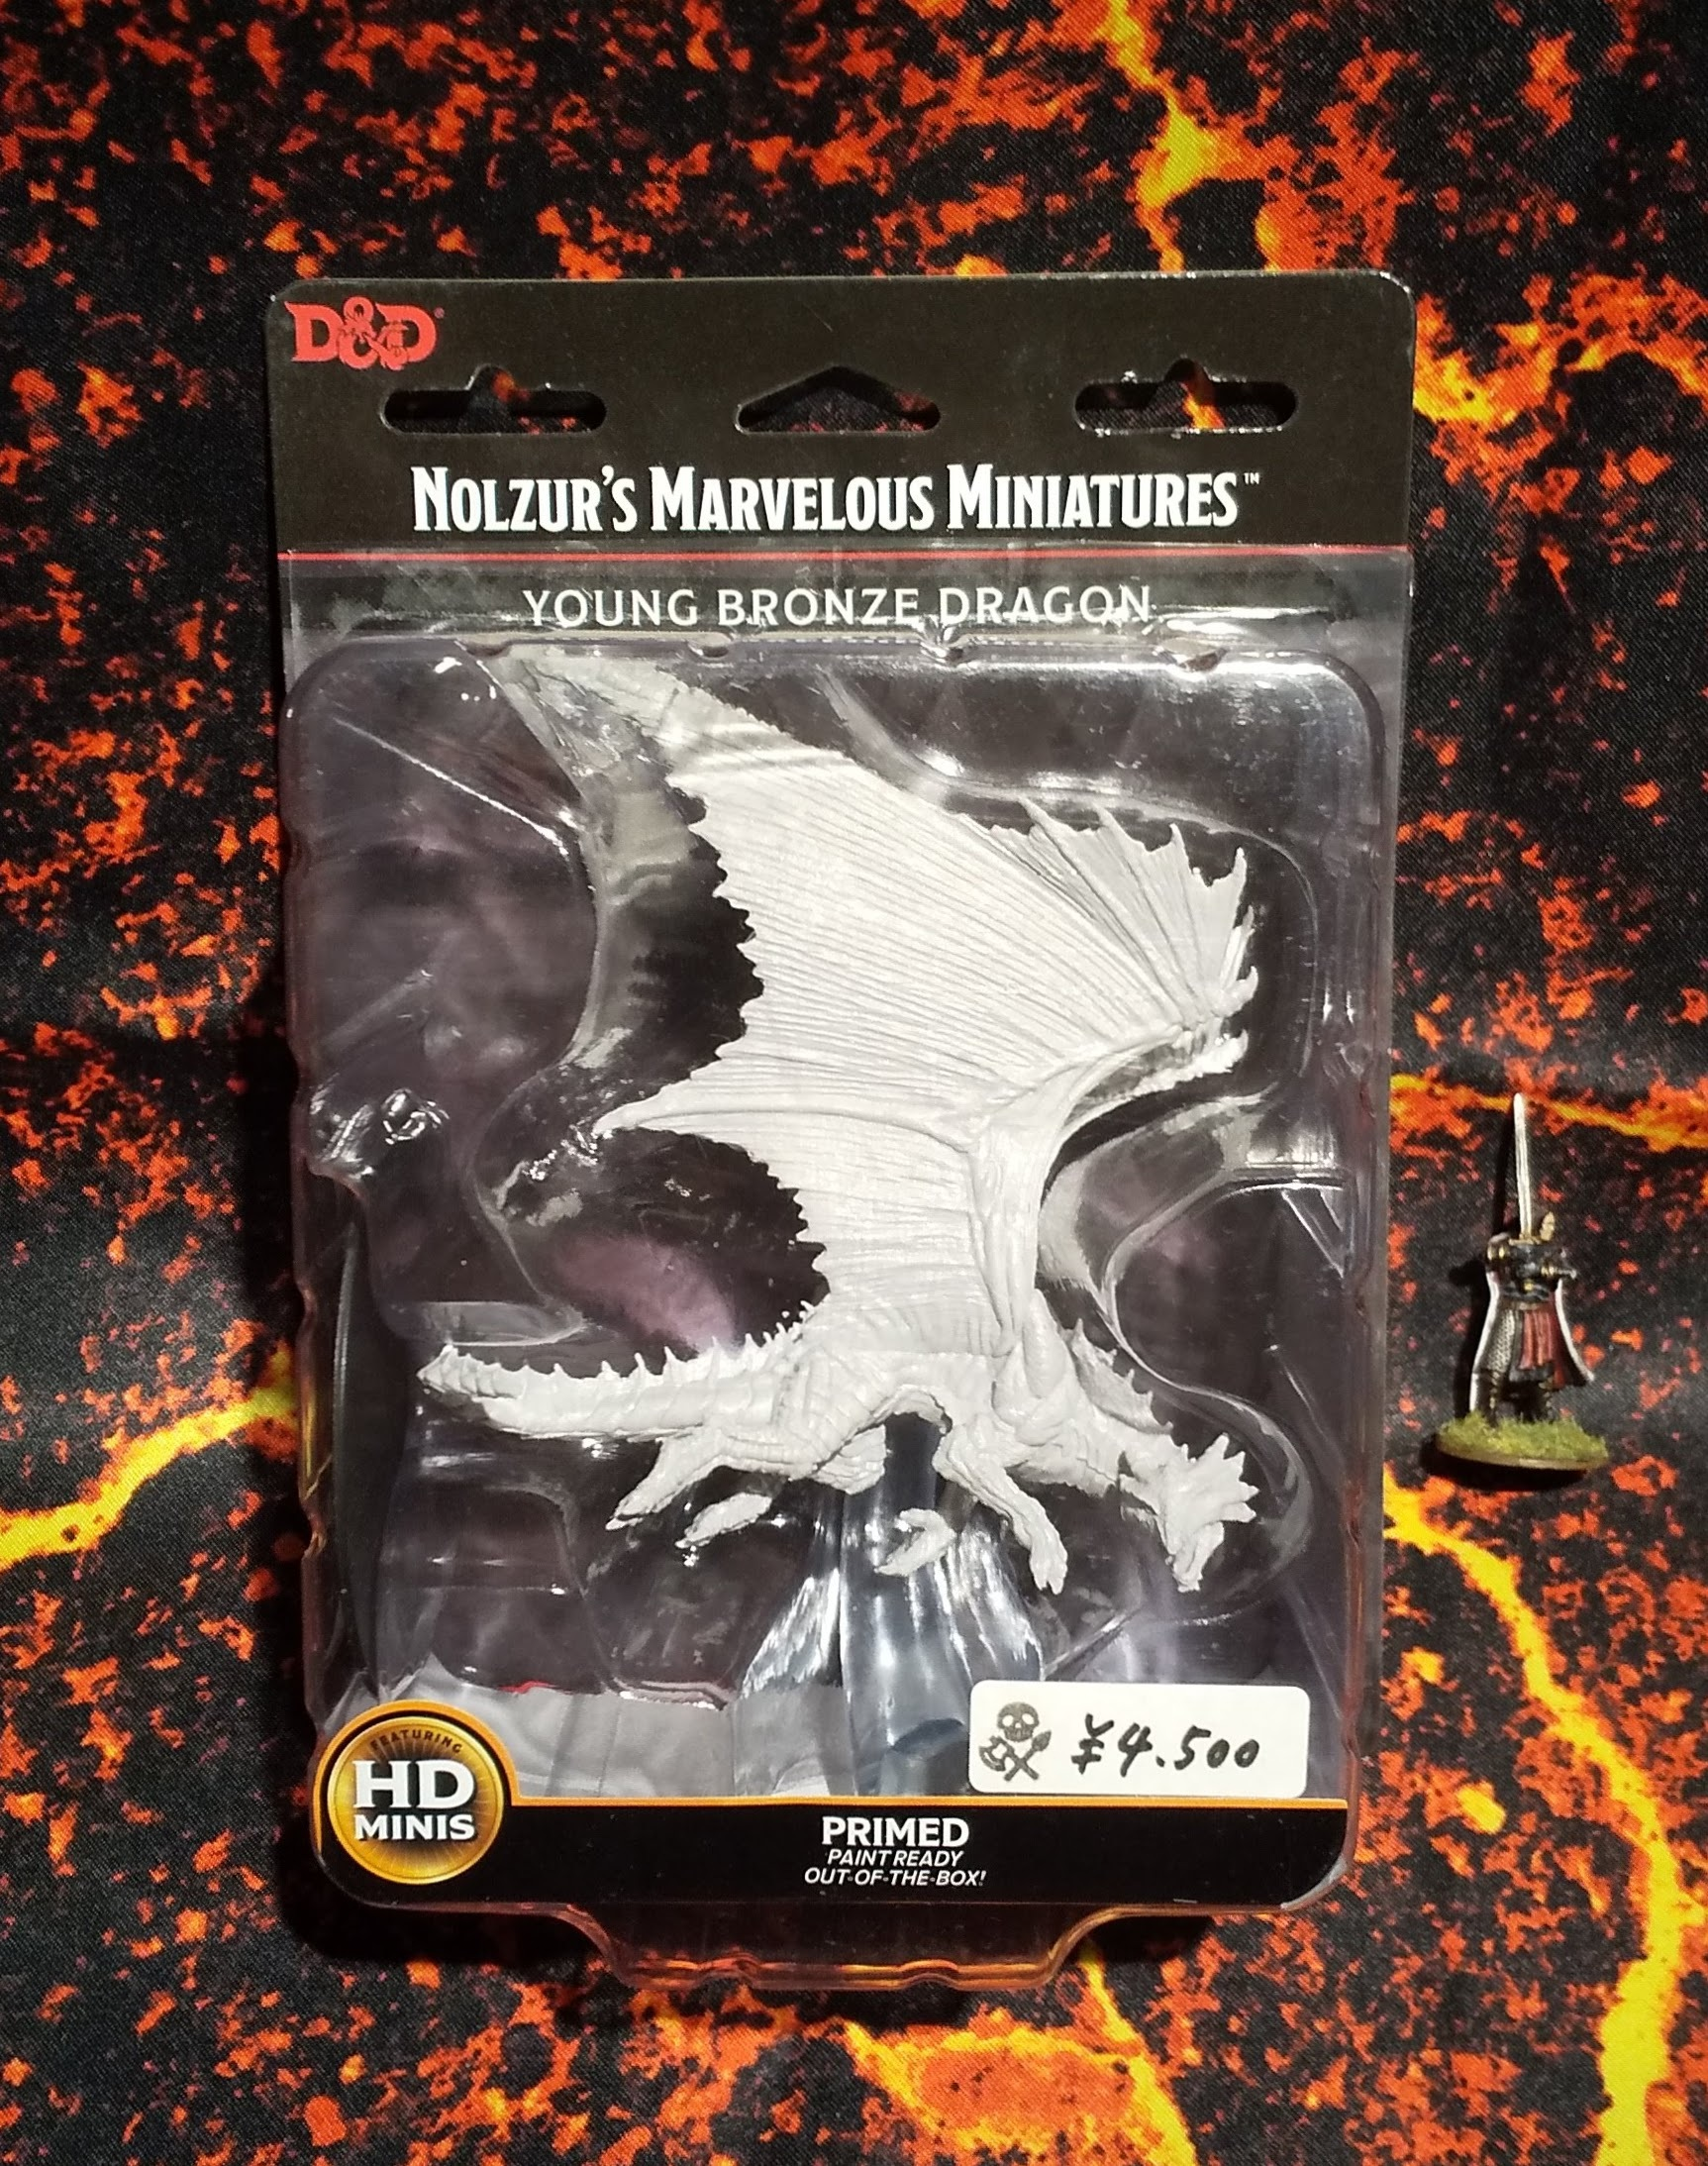 Young Bronze Dragon(D&Dオフィシャルミニチュア「Nolzur's Marvelous Unpainted Miniatures」シリーズ)